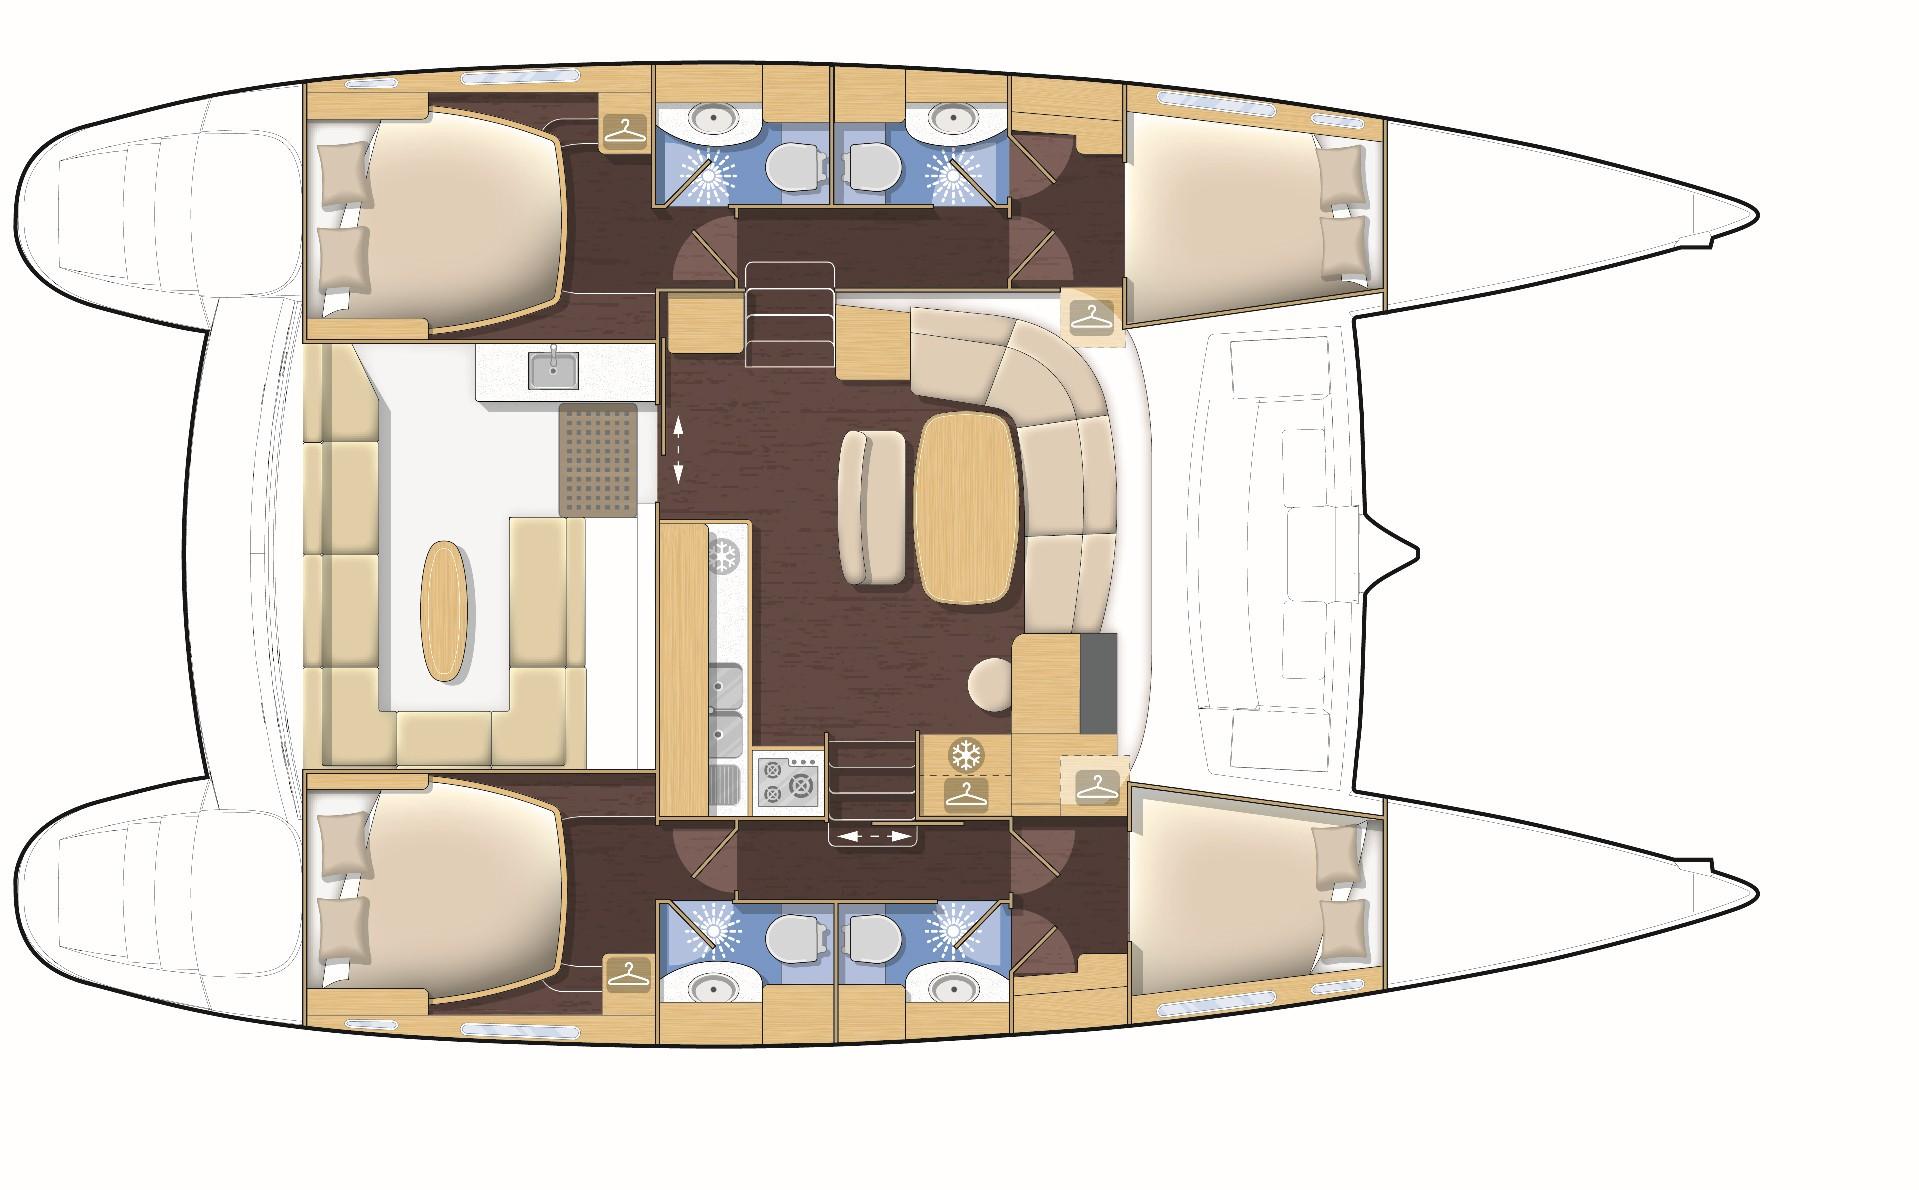 Used Sail Catamaran for Sale 2007 Lagoon 440 Layout & Accommodations